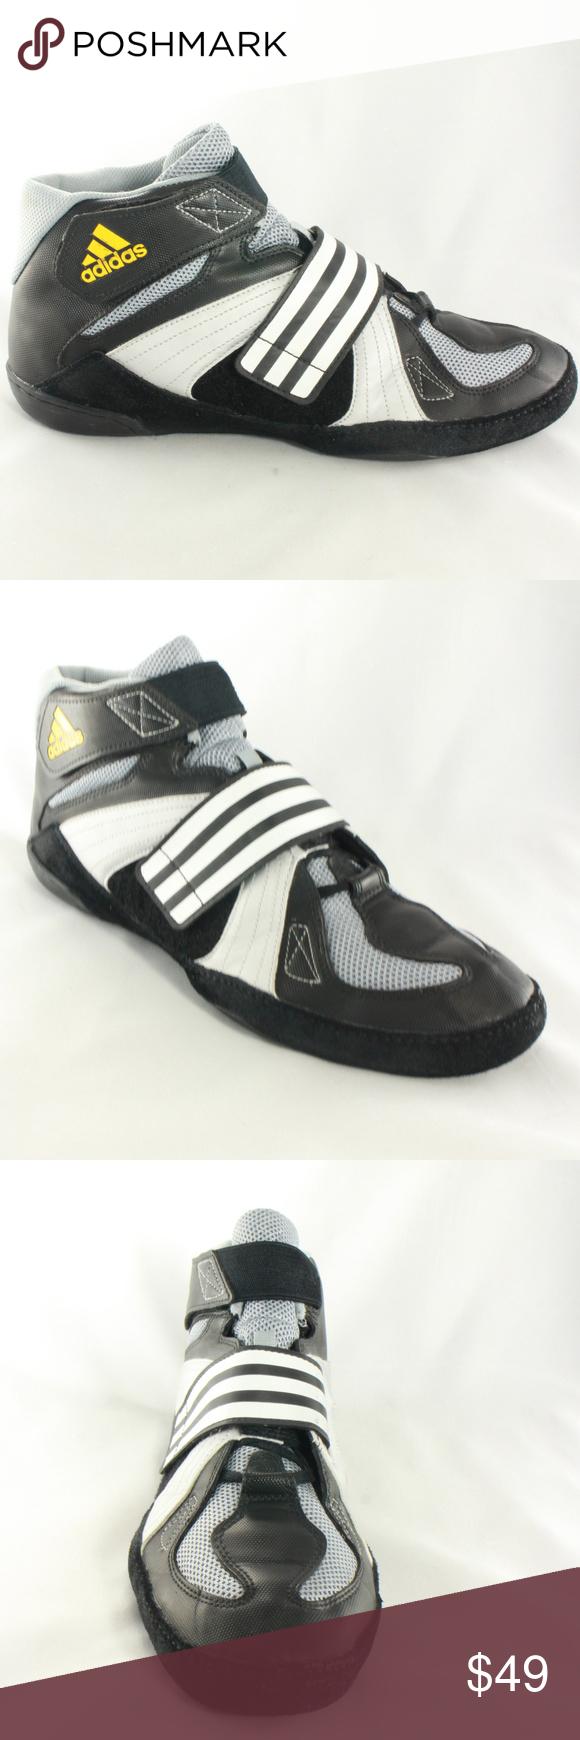 ADIDAS Extero II Wrestling Shoes G02590